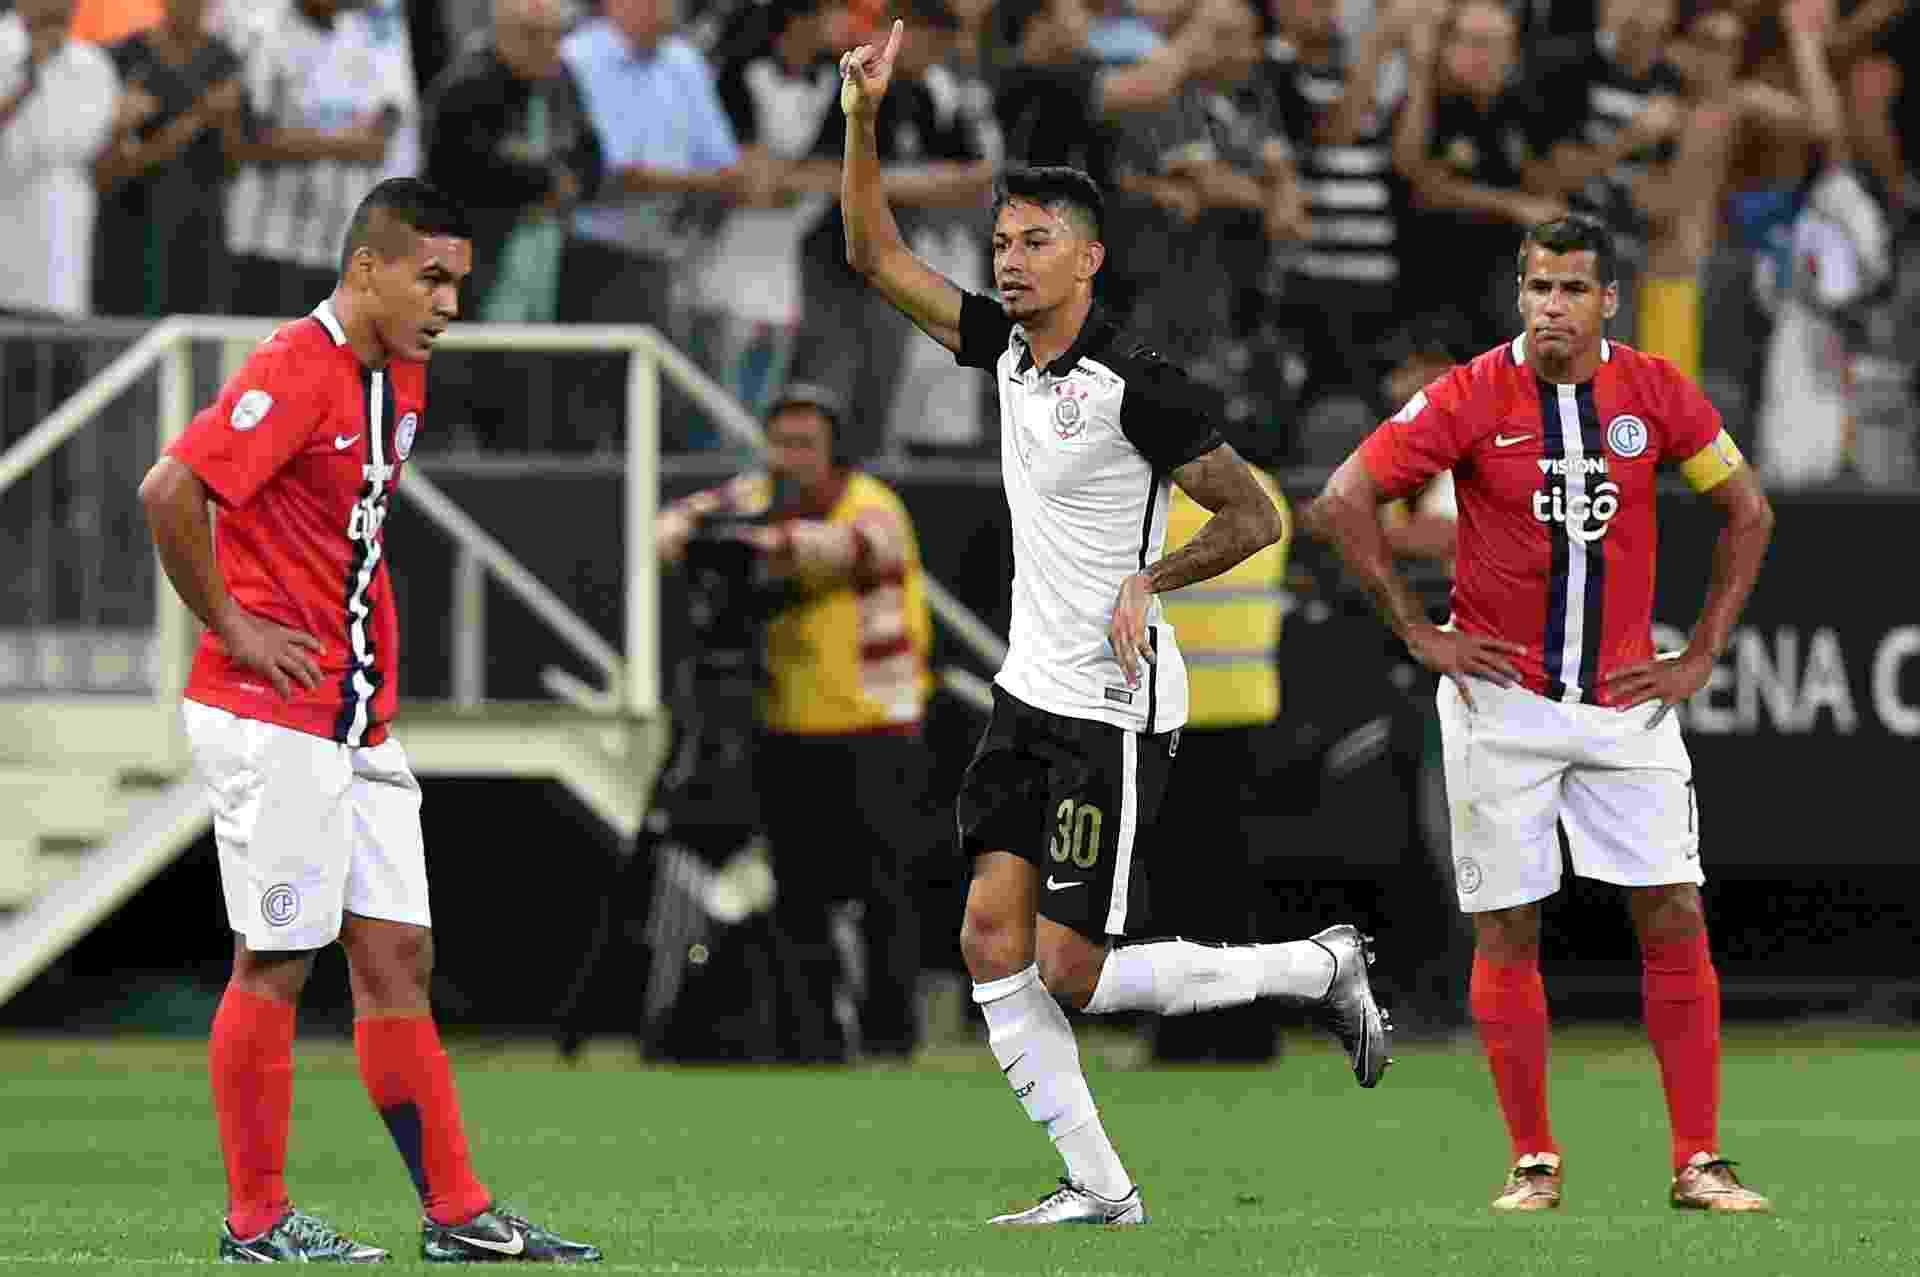 Lucca comemora o seu gol marcado pelo Corinthians contra o Cerro Porteño, na Libertadores - AFP PHOTO / Nelson ALMEIDA